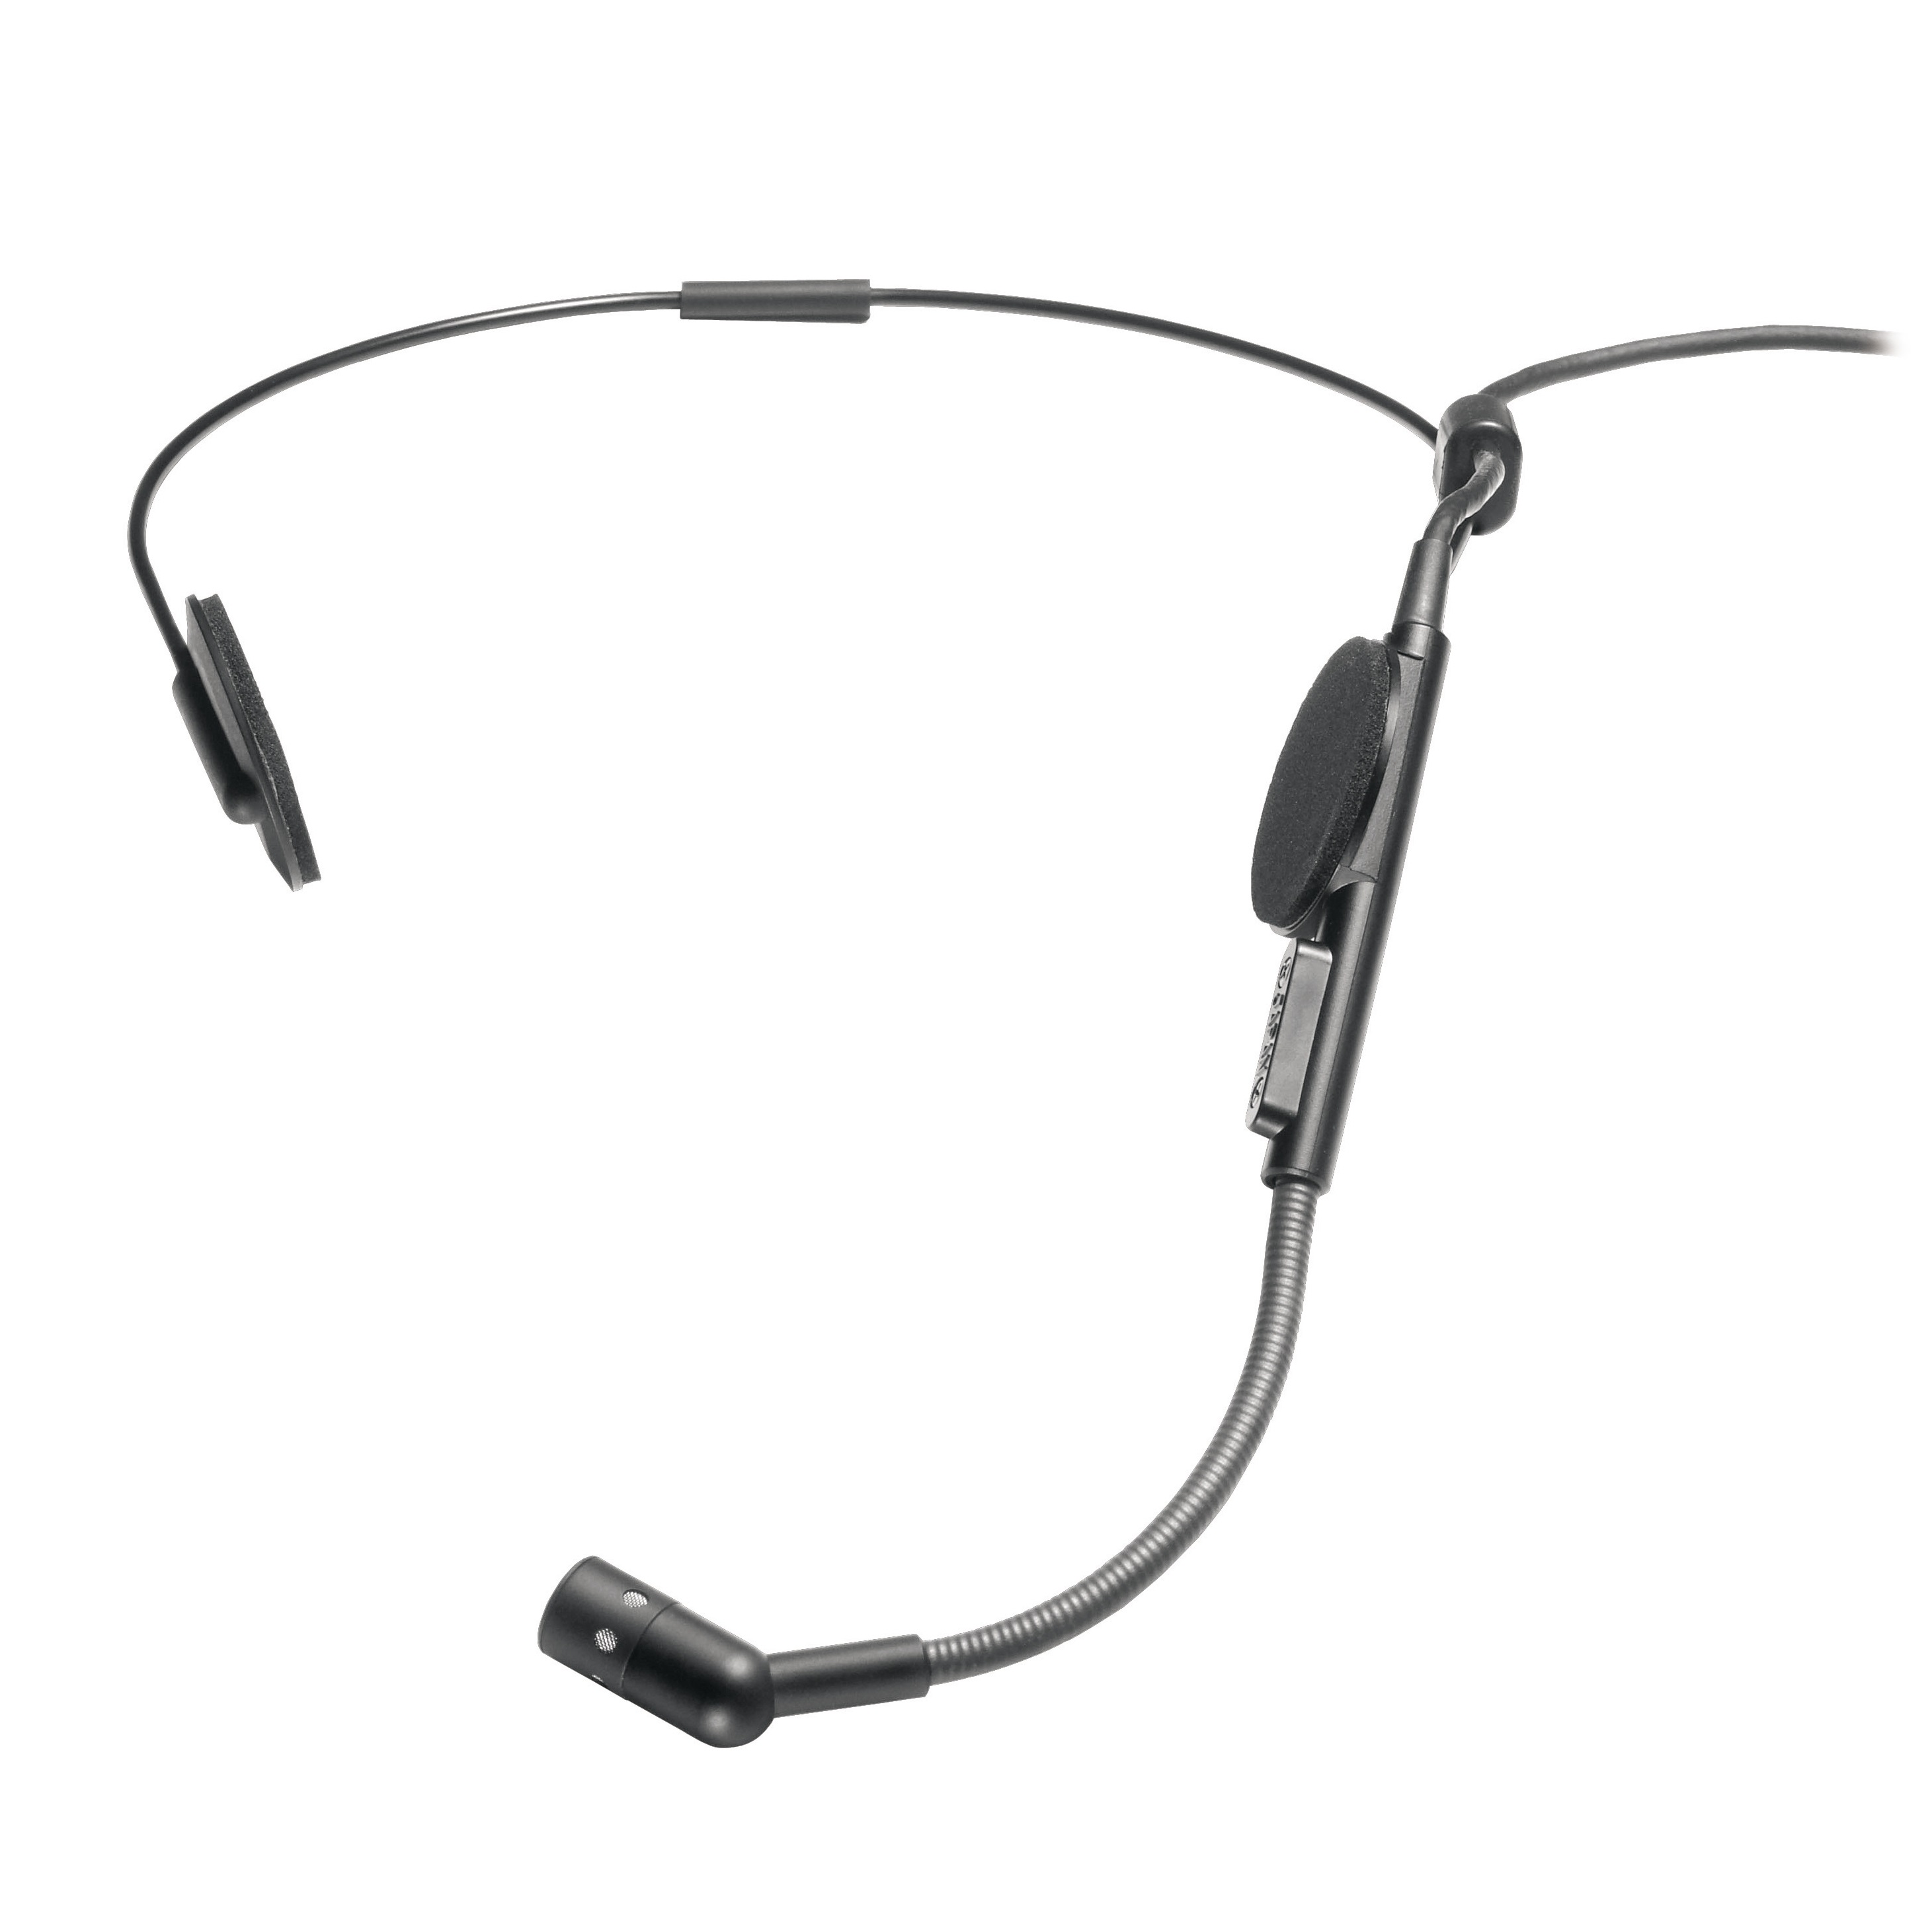 Audio-Technica ATM73cW